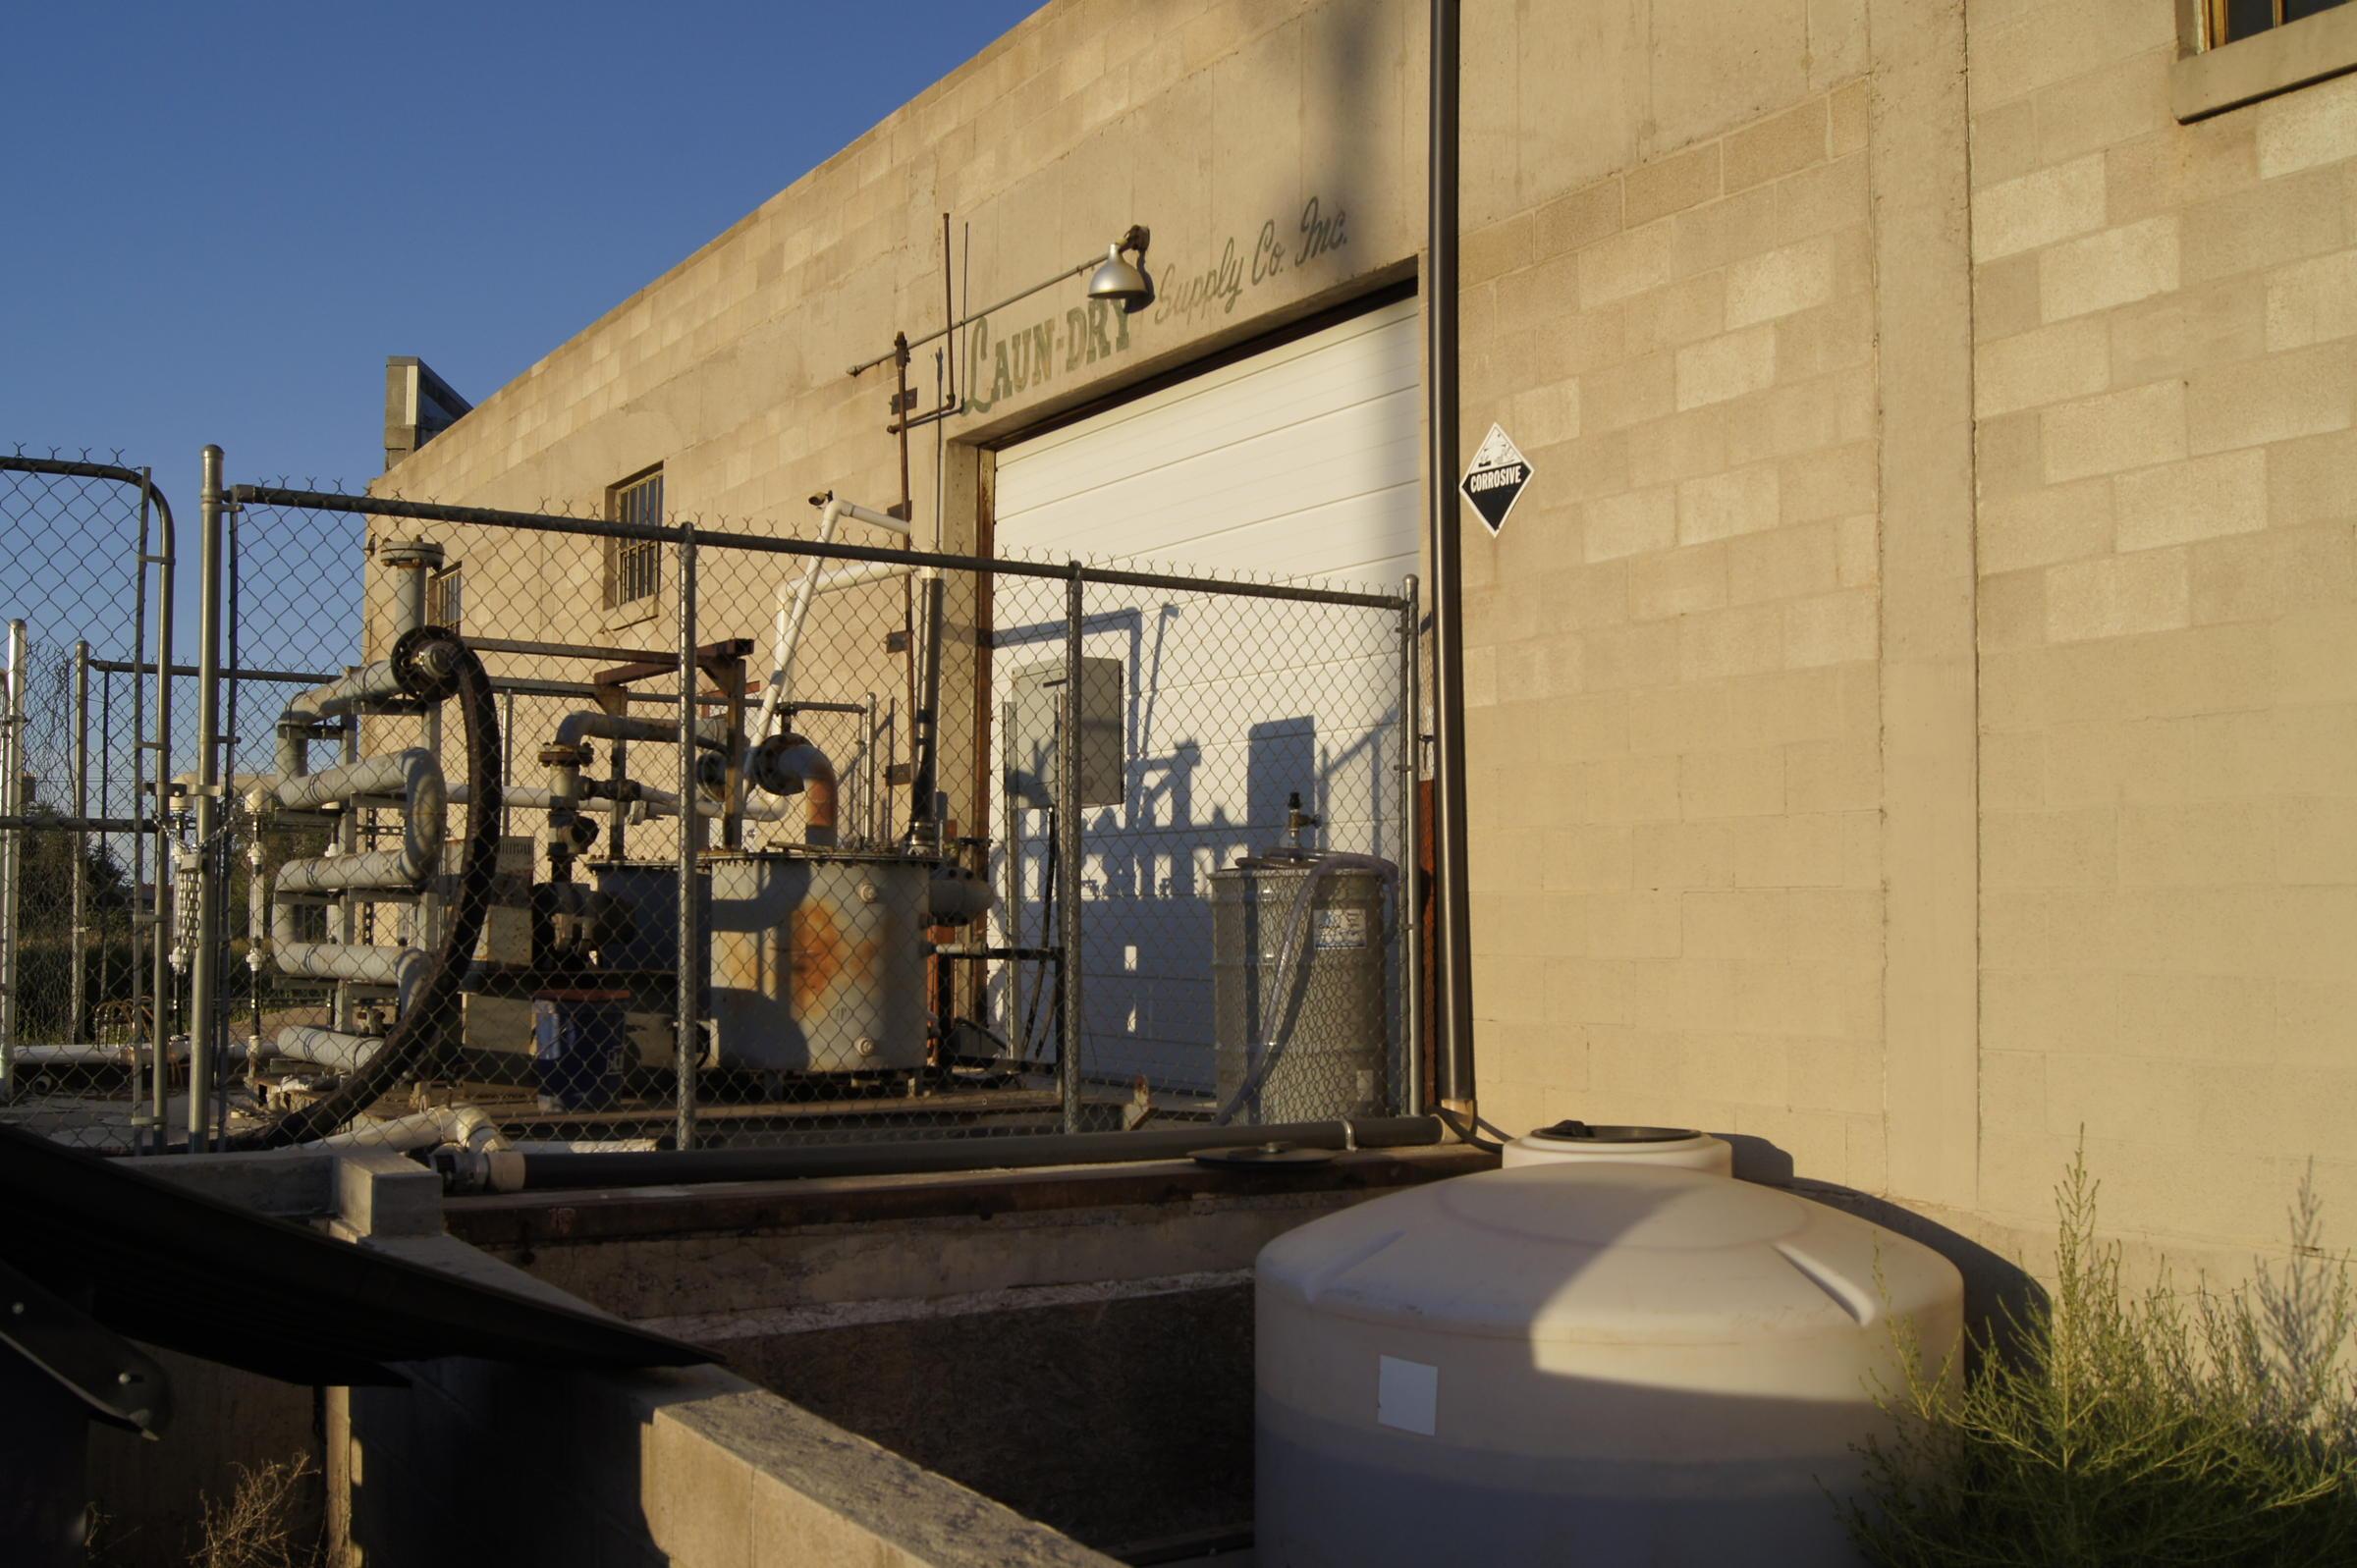 Soil vapor extraction unit sits on laun dry s rear loading dock